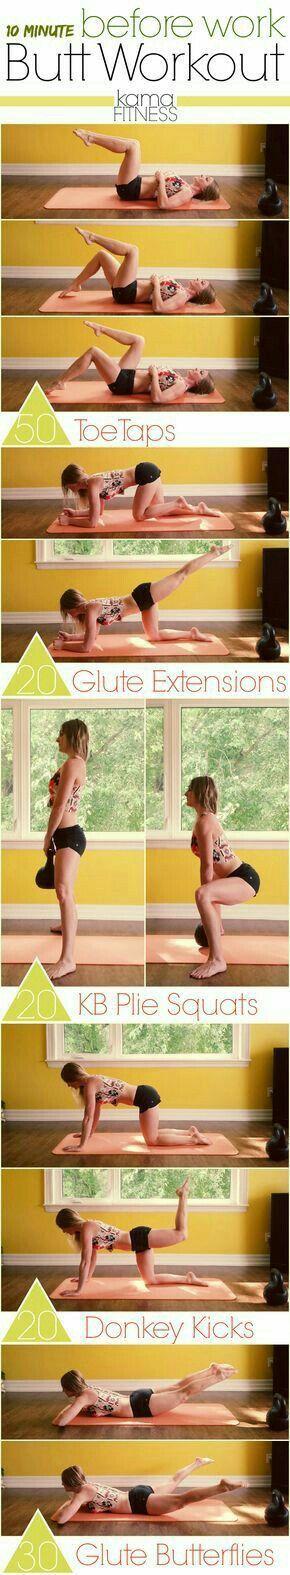 10 minute before work butt workout  | Posted By: CustomWeightLossProgram.com